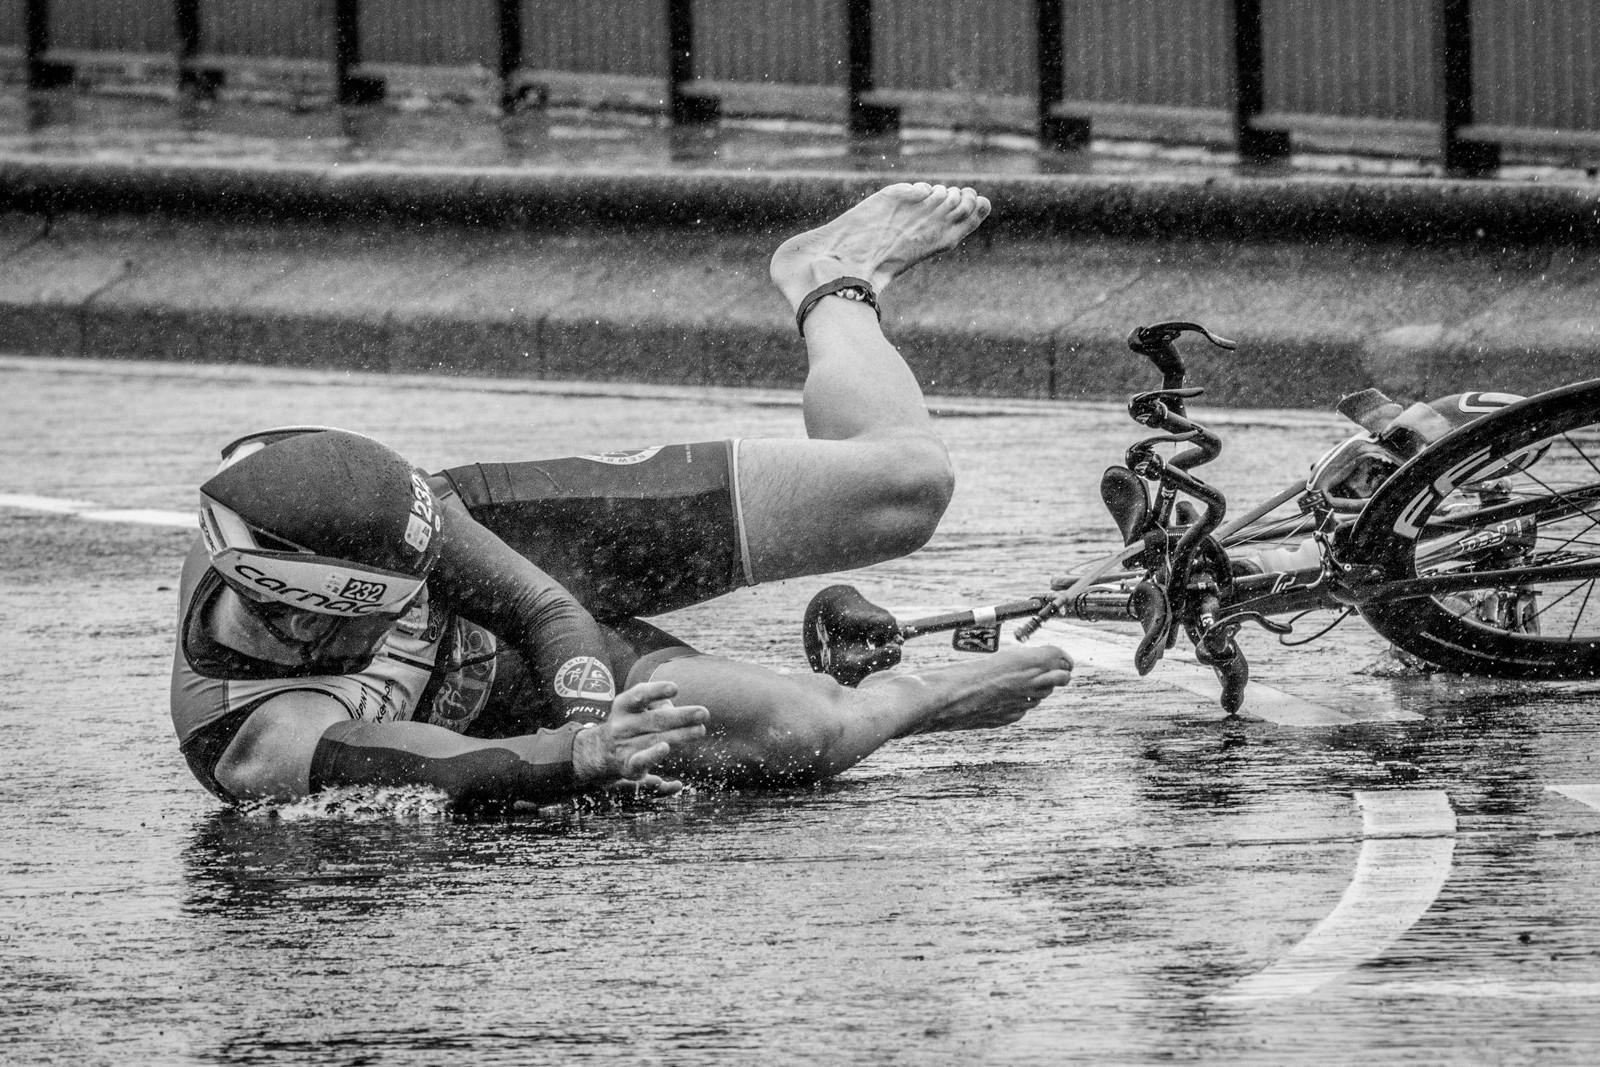 MONO - Belfast Triathlon 2018 by Frances Price (15 marks)